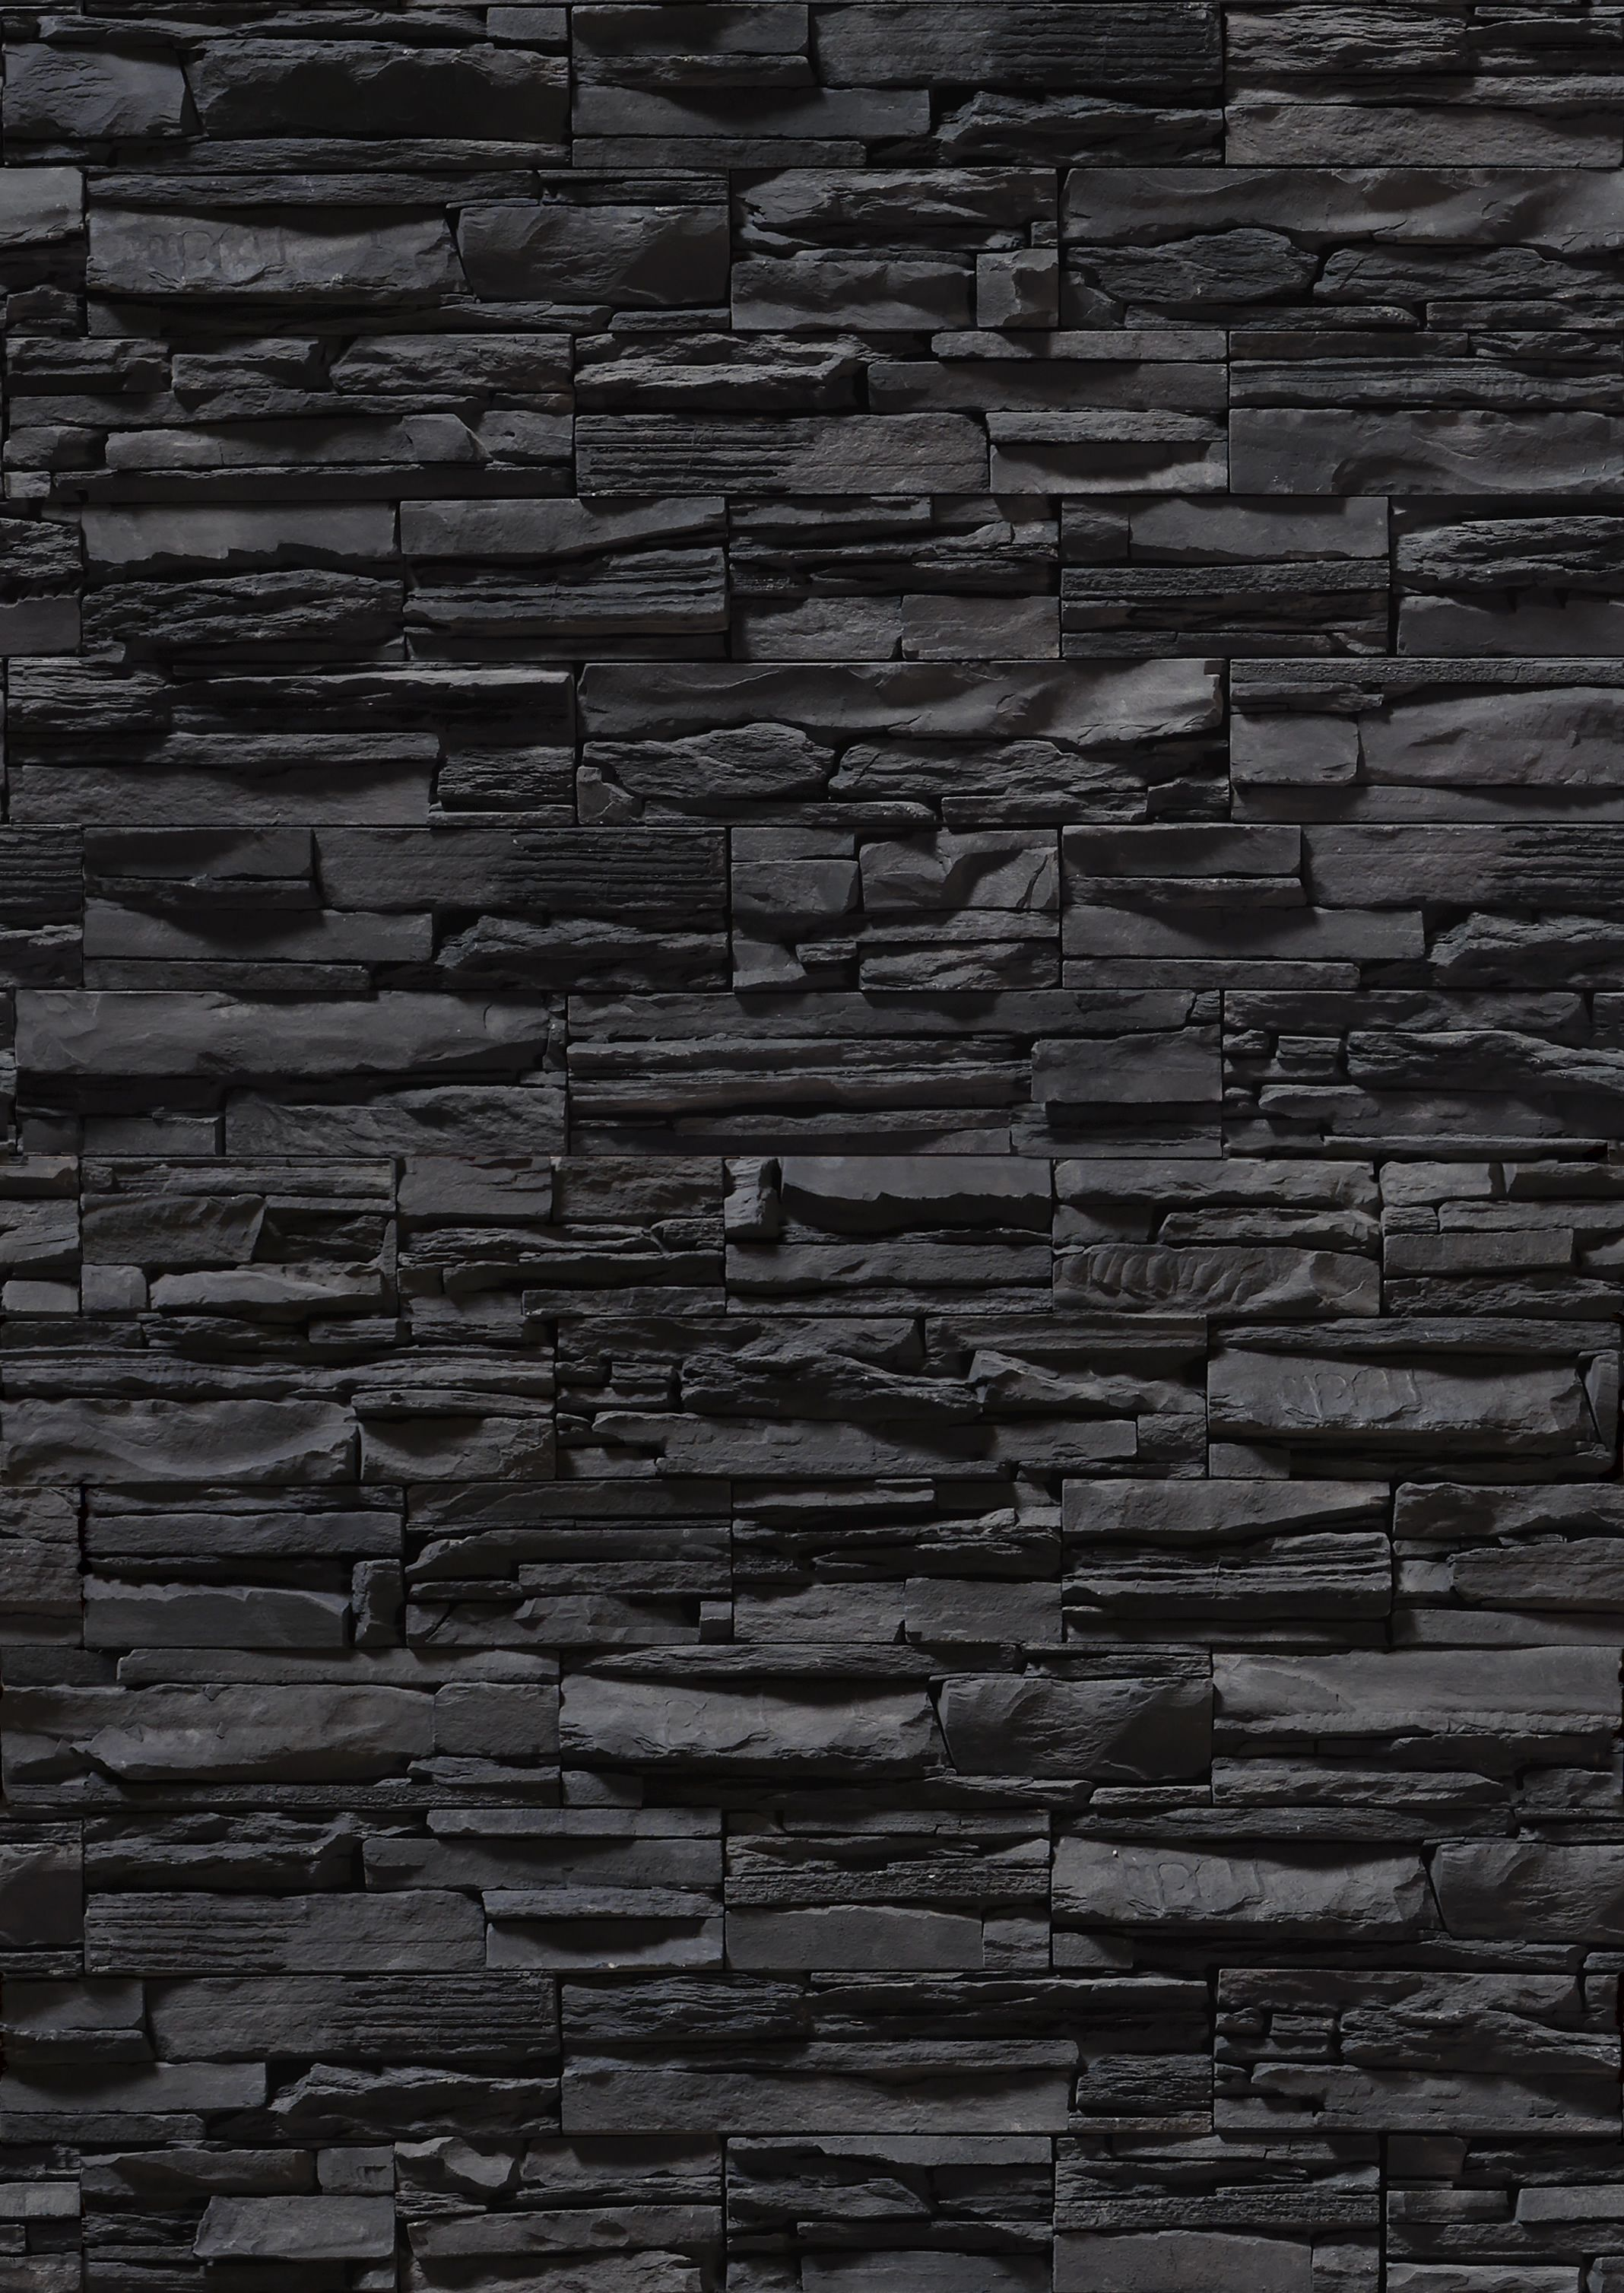 Pin By Taryn Slabbert On Textures Stone Wallpaper Stone Texture Black Brick